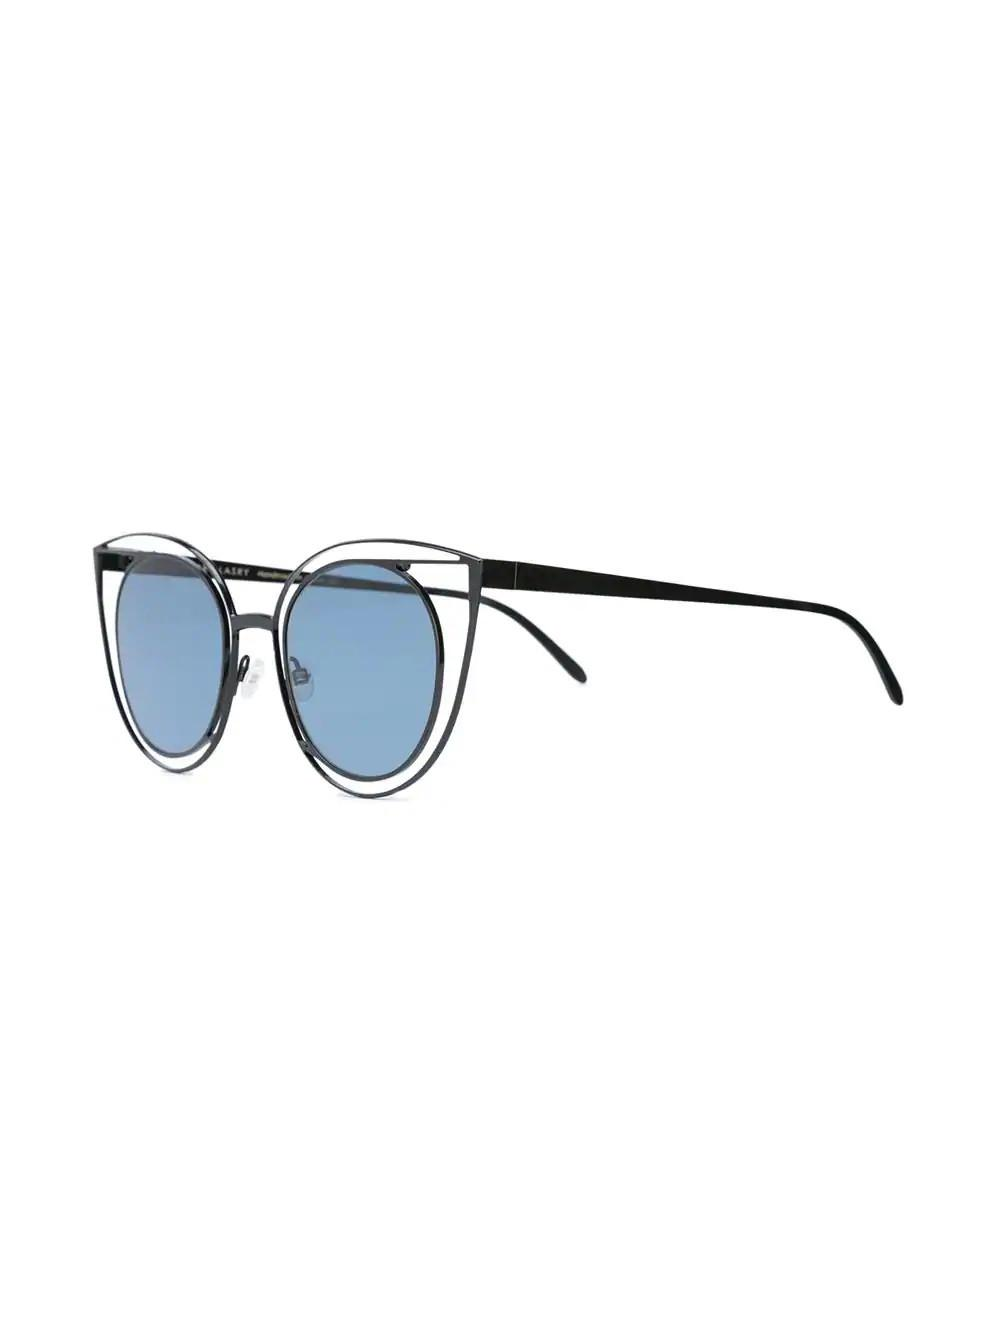 162141e54e Thierry Lasry - Blue Morphology Cat Eye Sunglasses - Lyst. View fullscreen